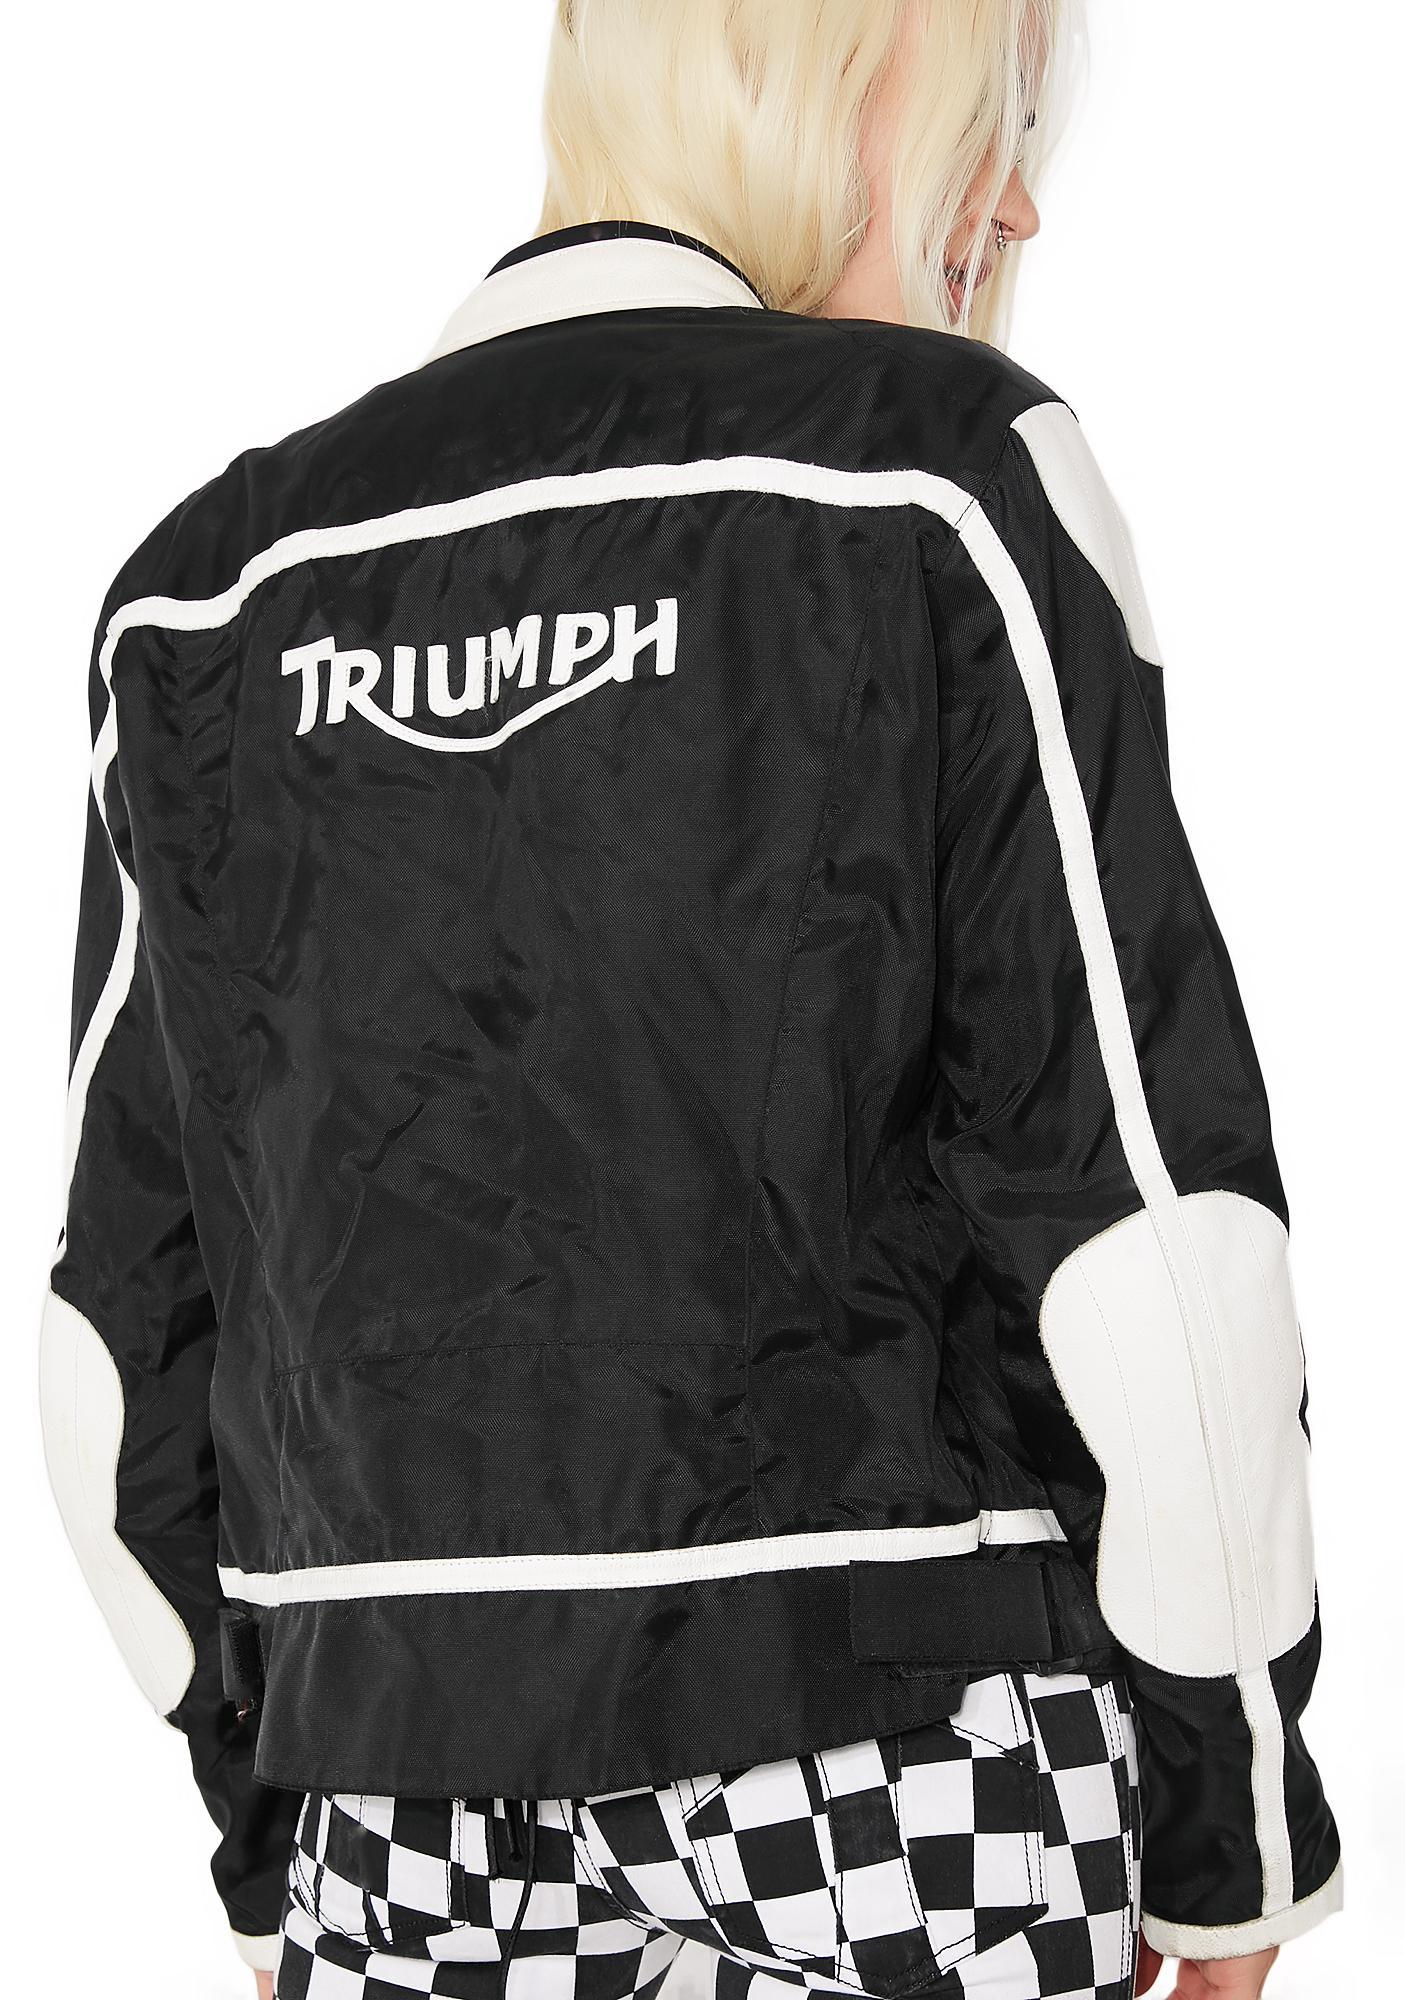 Vintage Triumph Black Racing Jacket